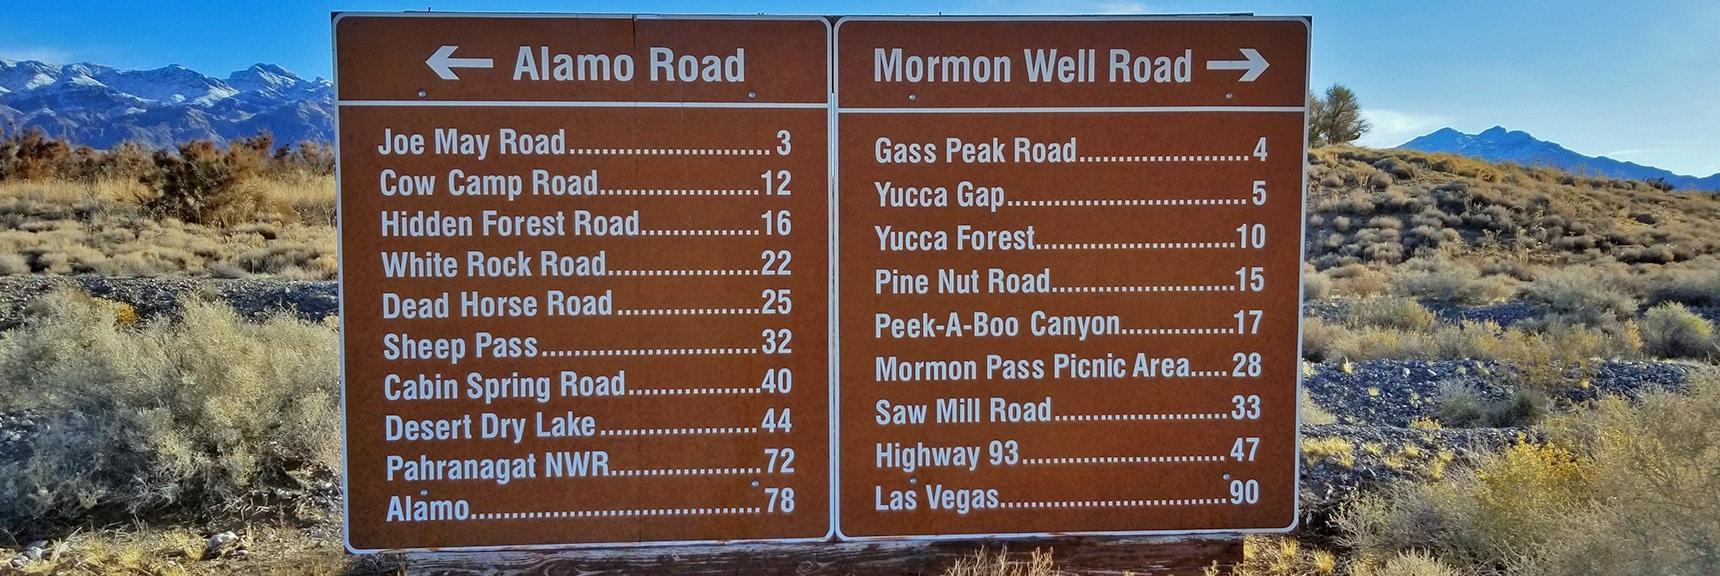 170 Miles of Unpaved Roads in the Desert National Wildlife Refuge | Smart Car Bike Rack and Mountain Bike Test, Sheep Range, Nevada